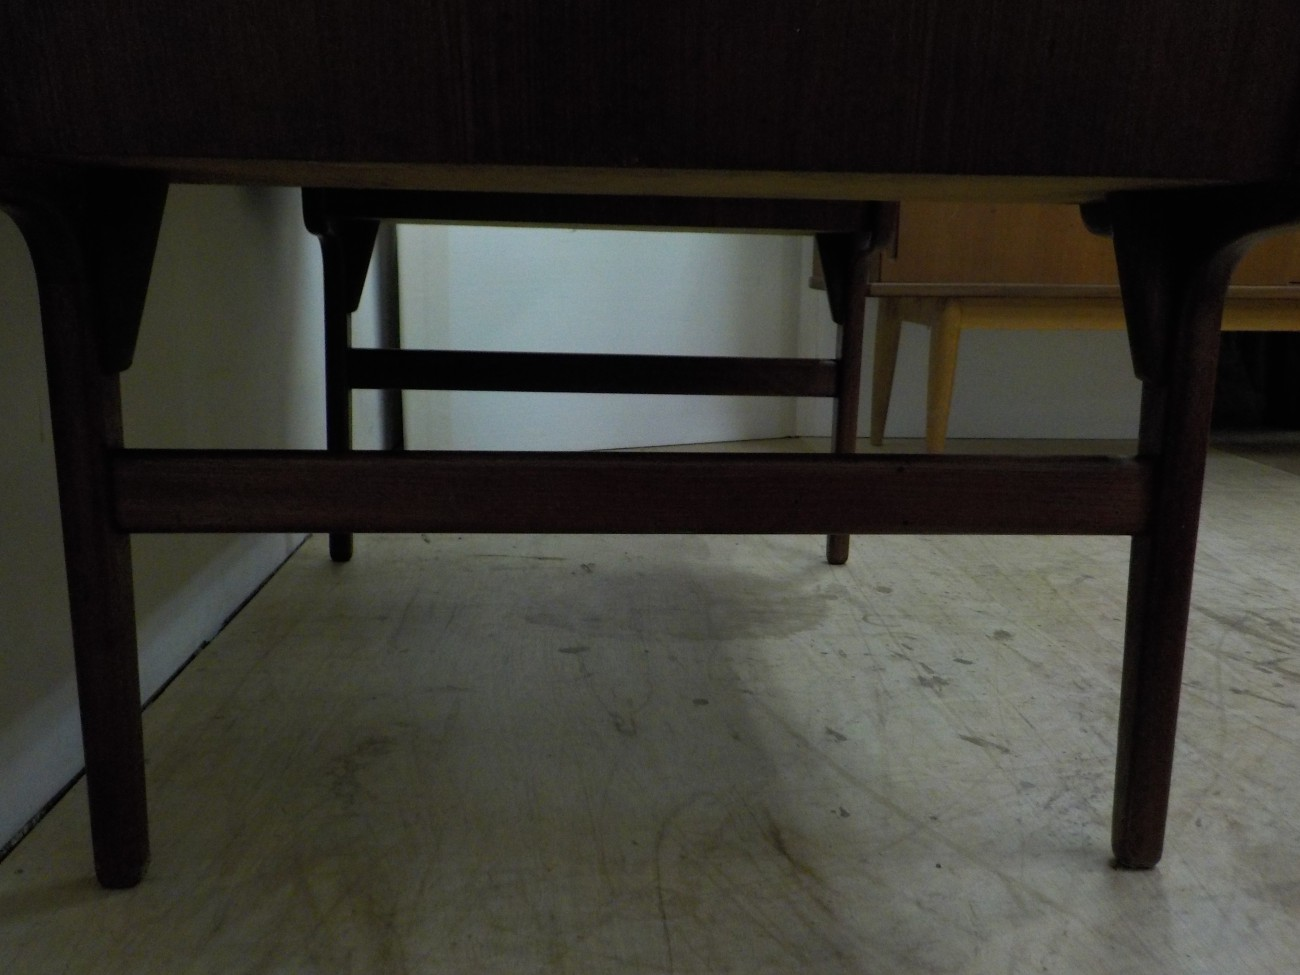 Desk / チーク エクステンション デスク / stock2012-25